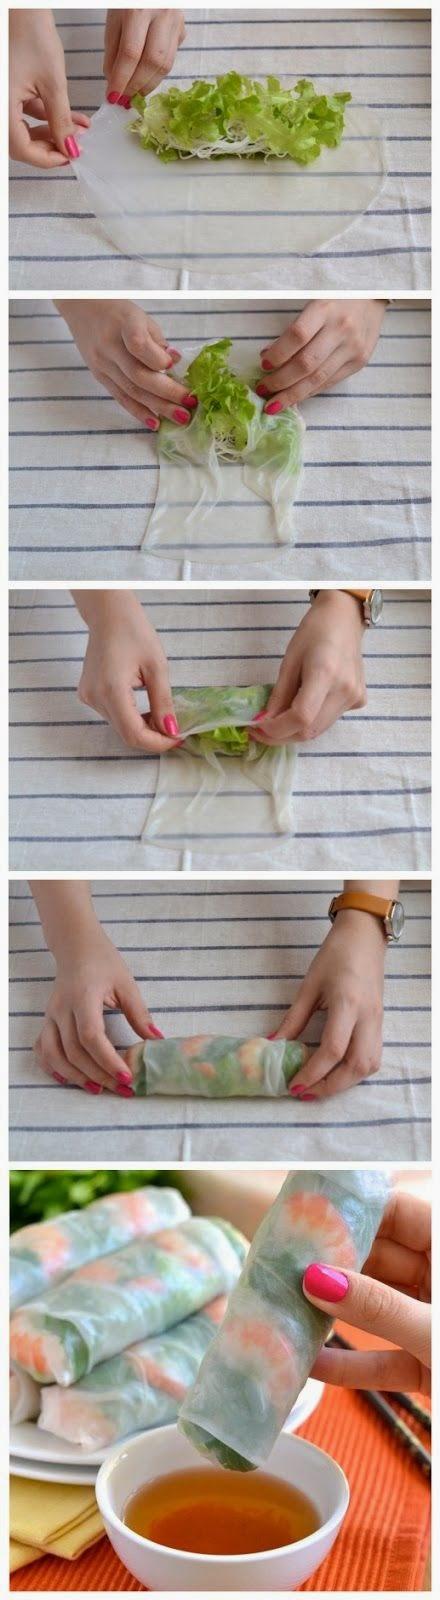 How to Make Vietnamese Fresh Spring Rolls | Food drink